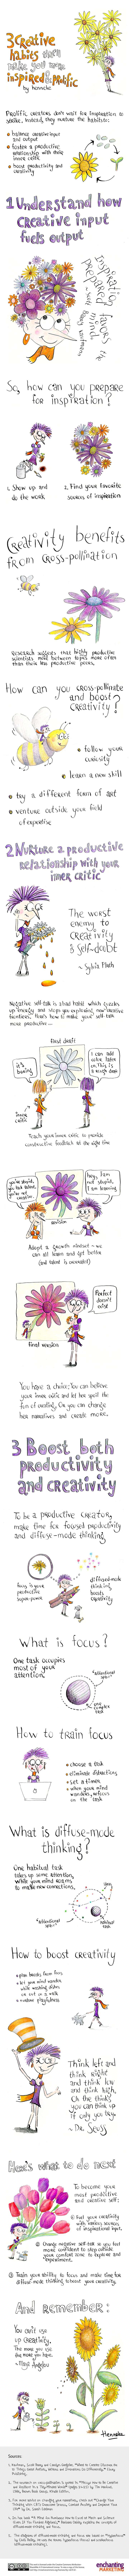 3-creative-habits-infographic-final